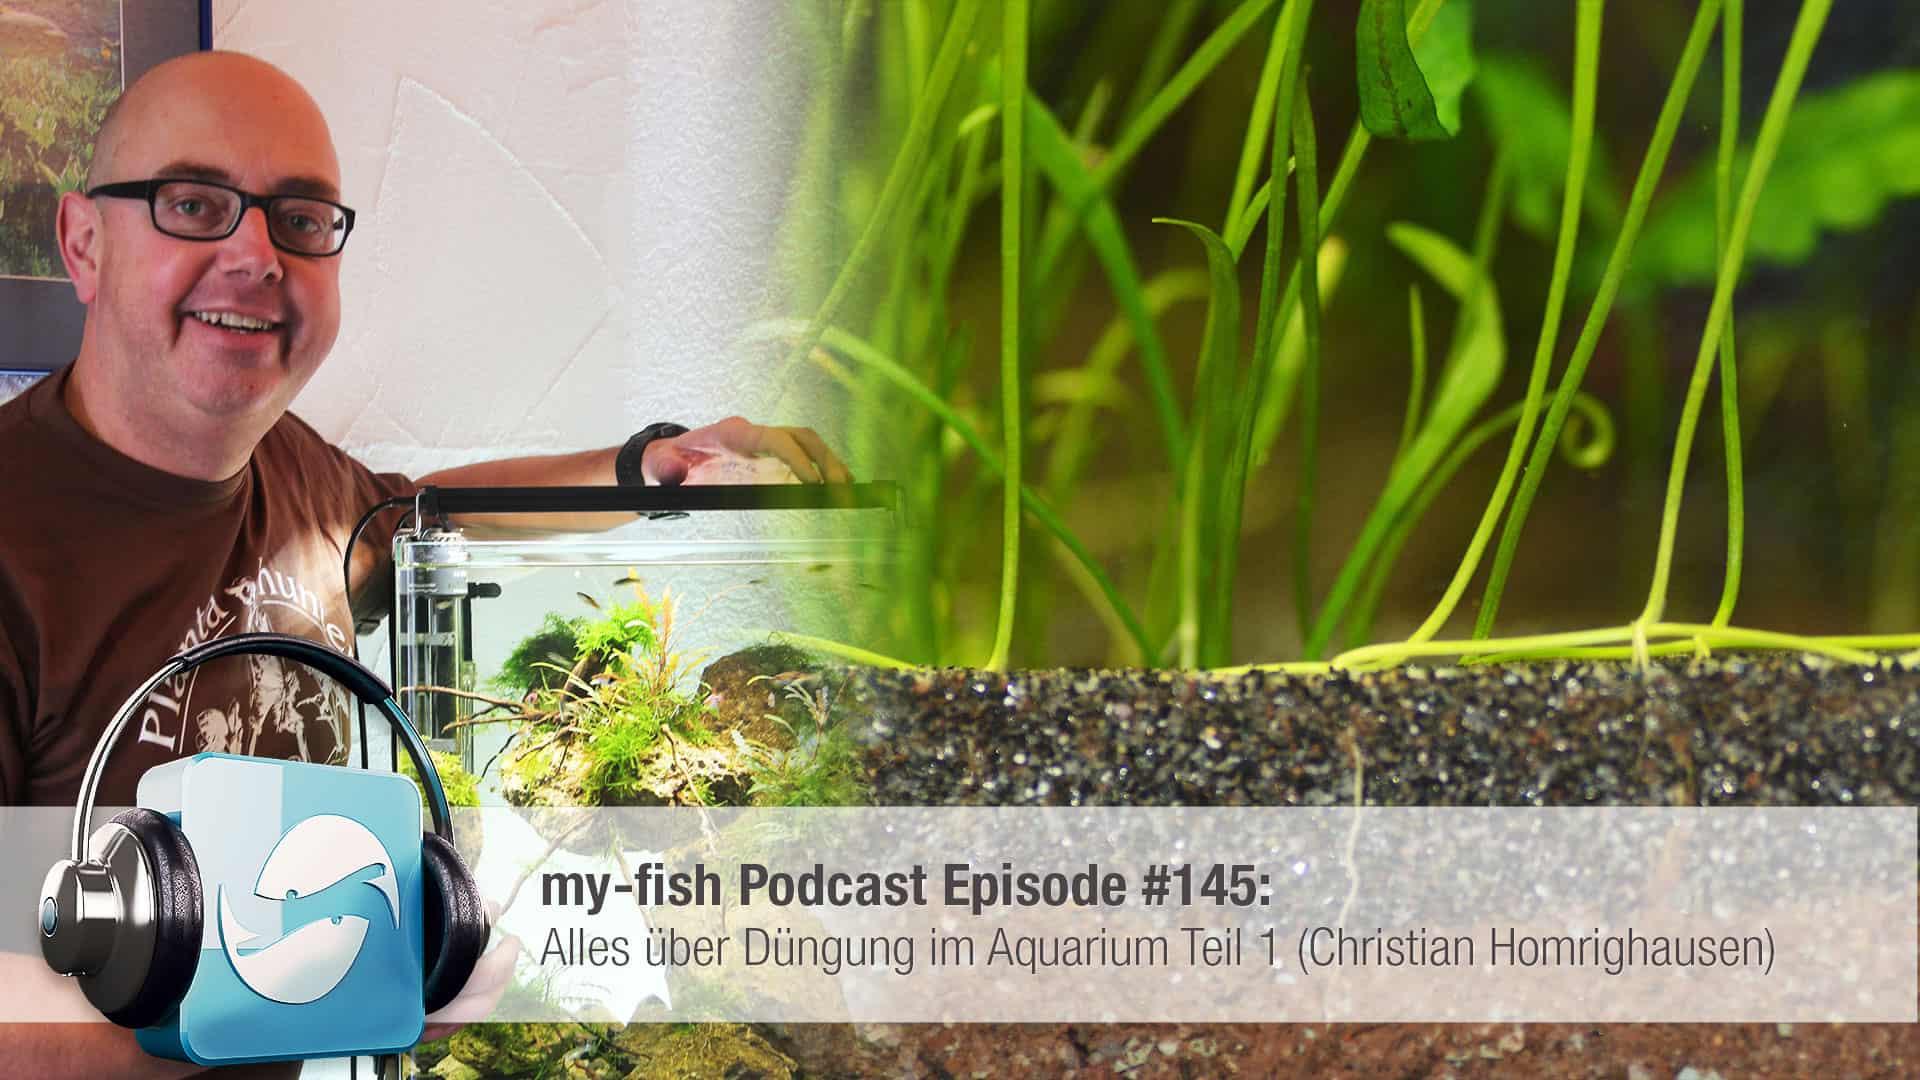 Podcast Episode #145: Alles über Düngung im Aquarium Teil 1 (Christian Homrighausen) 1